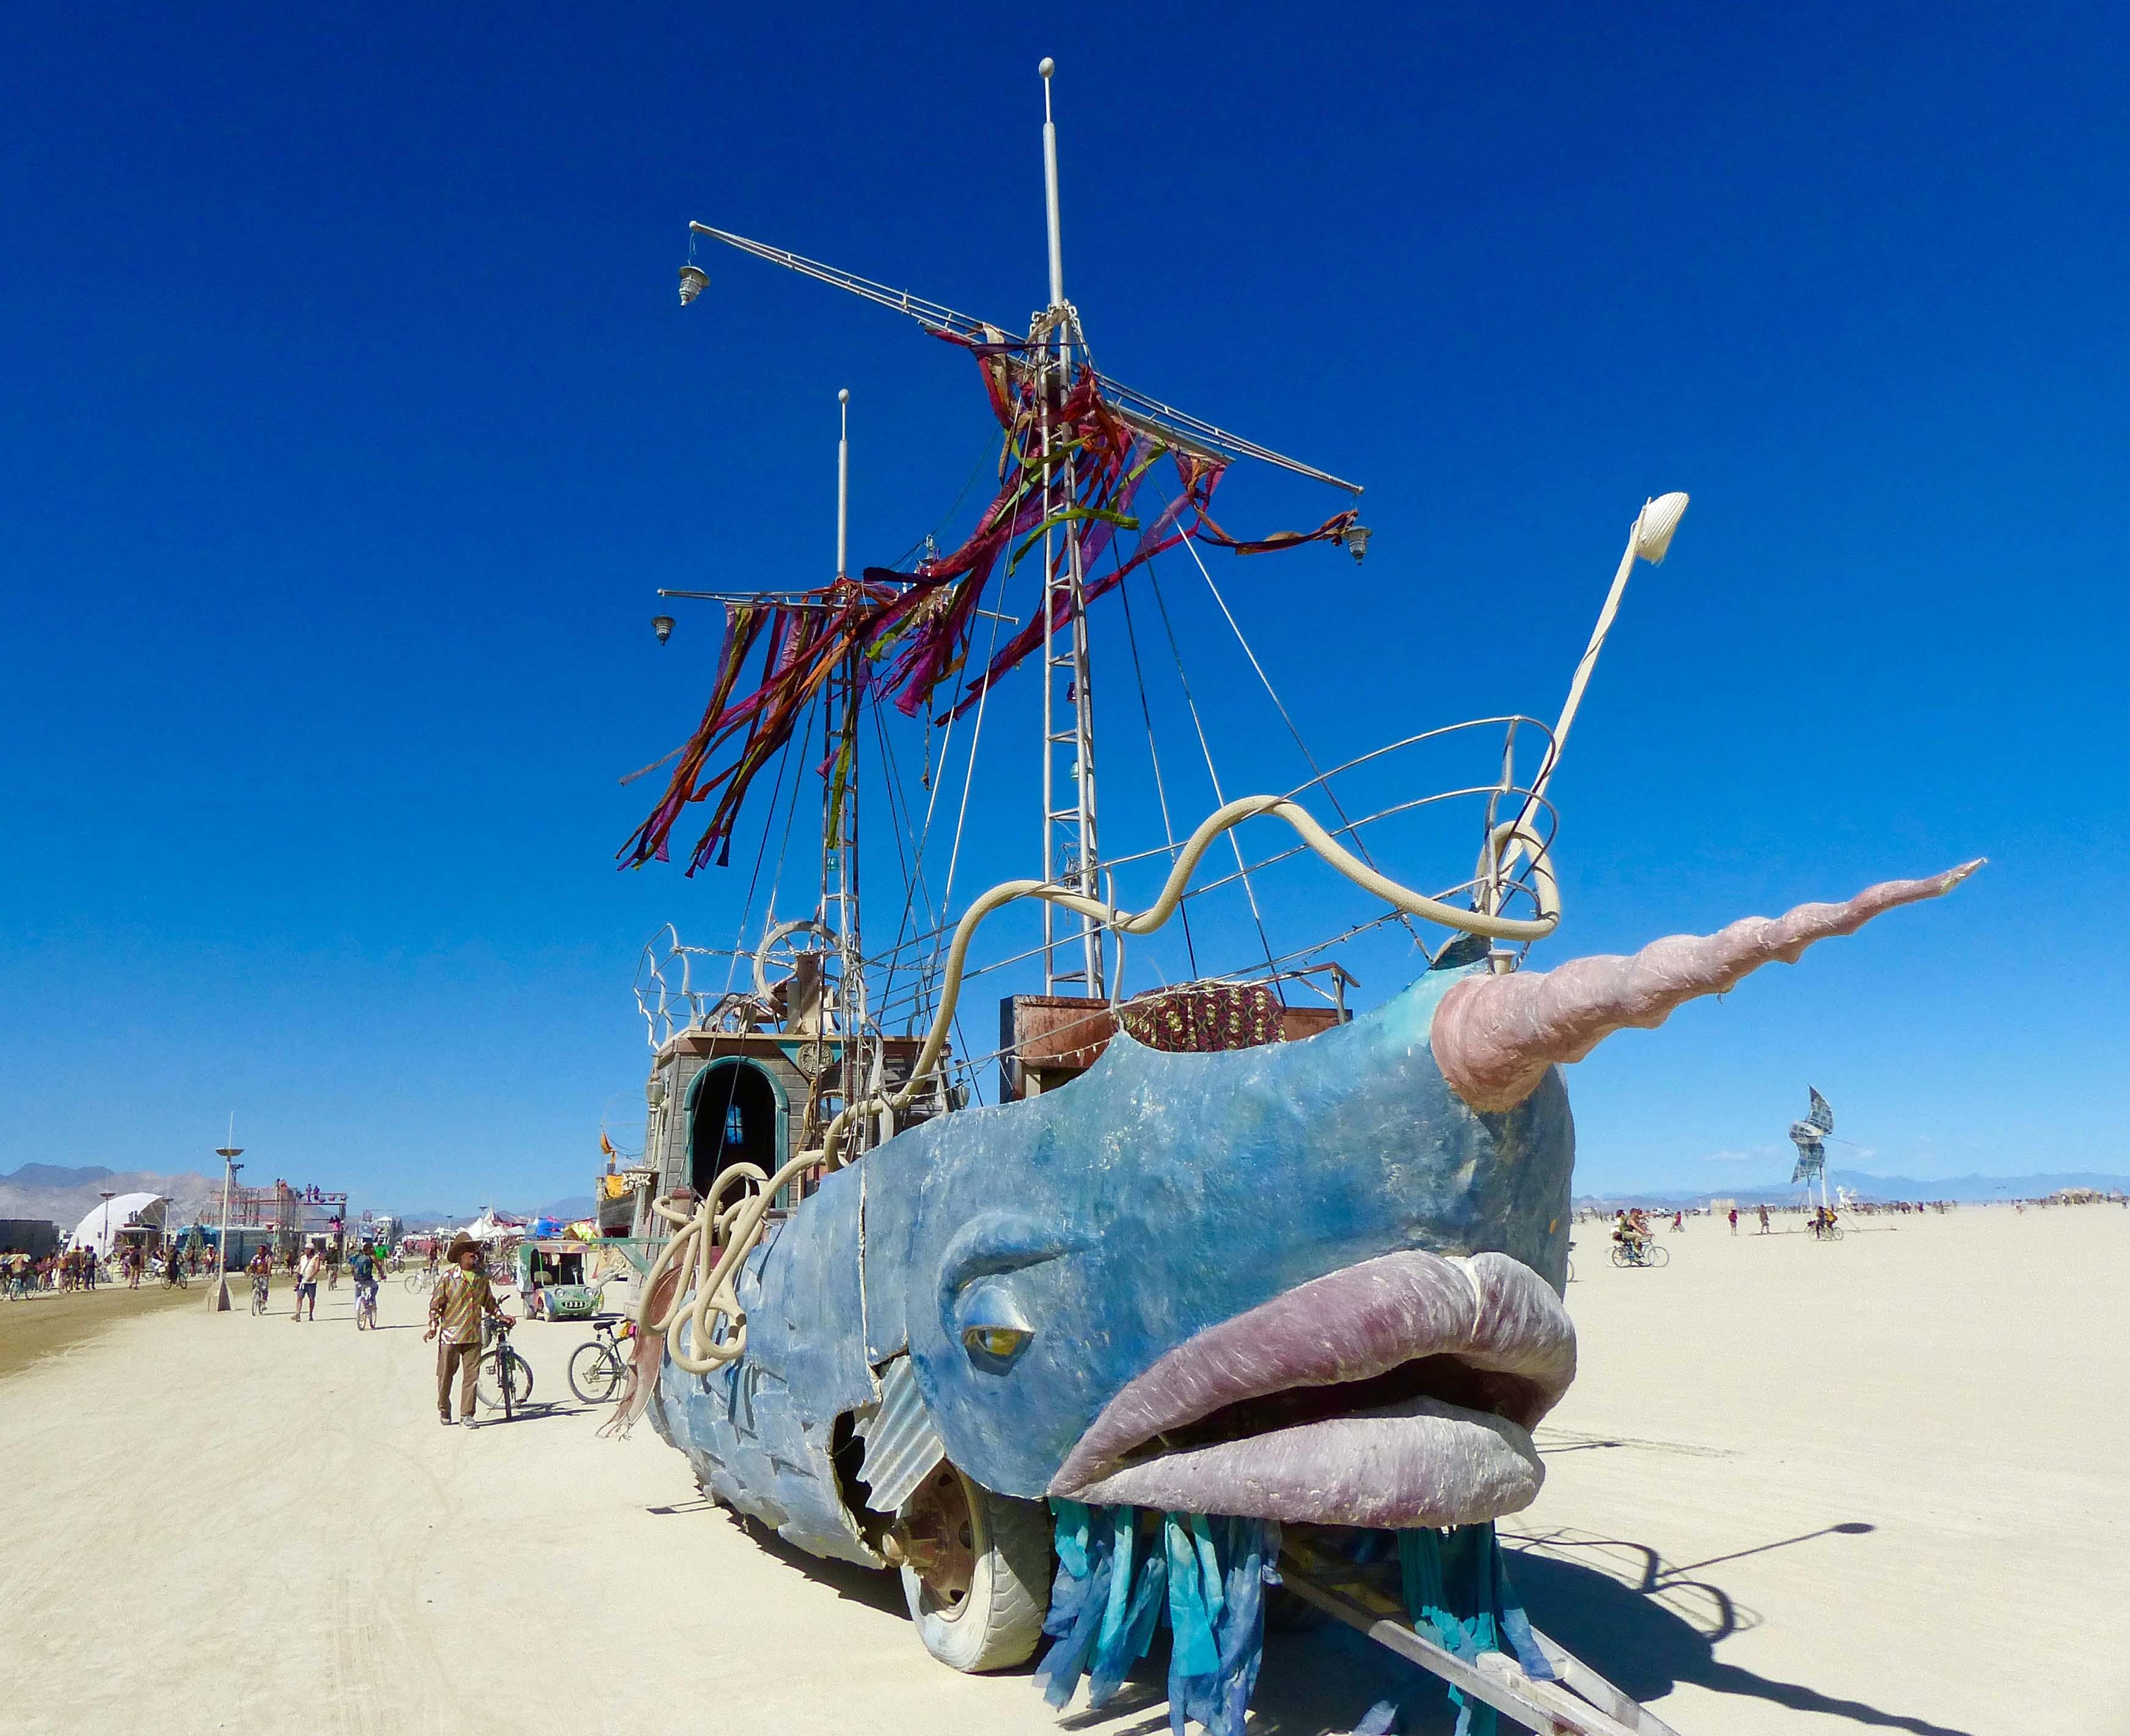 Narwhal mutant Vehicle at Burning Man 2015